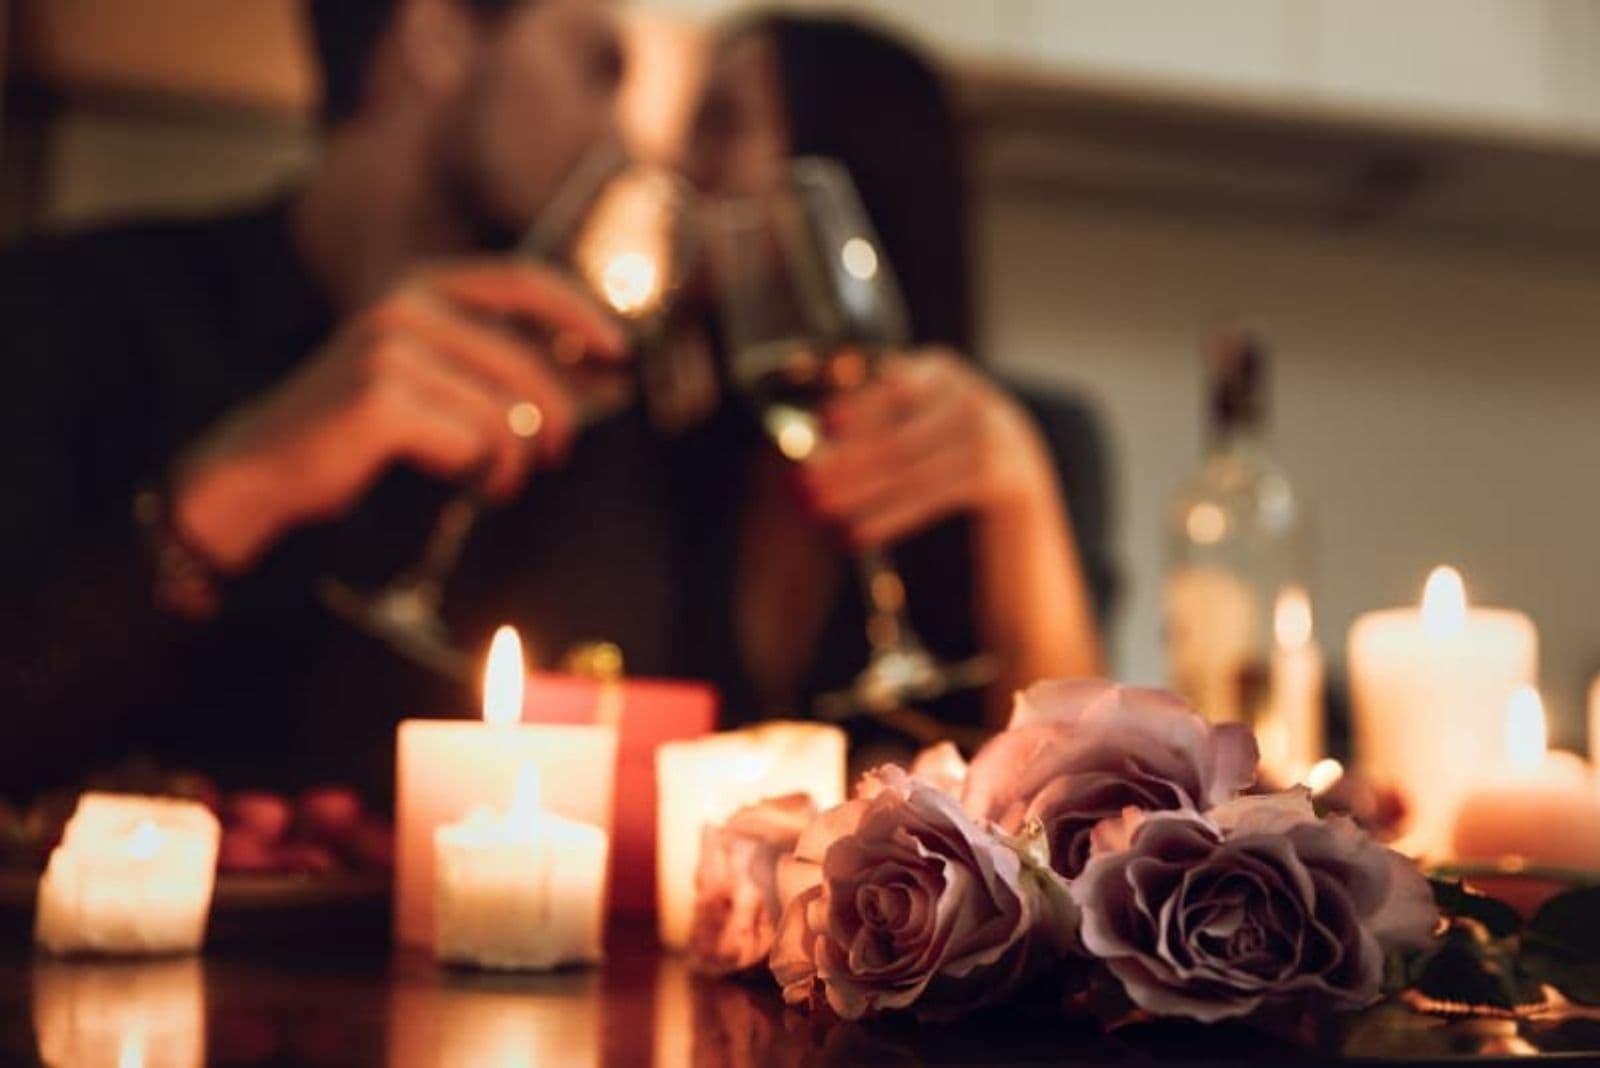 couple drinking wine and celebrating